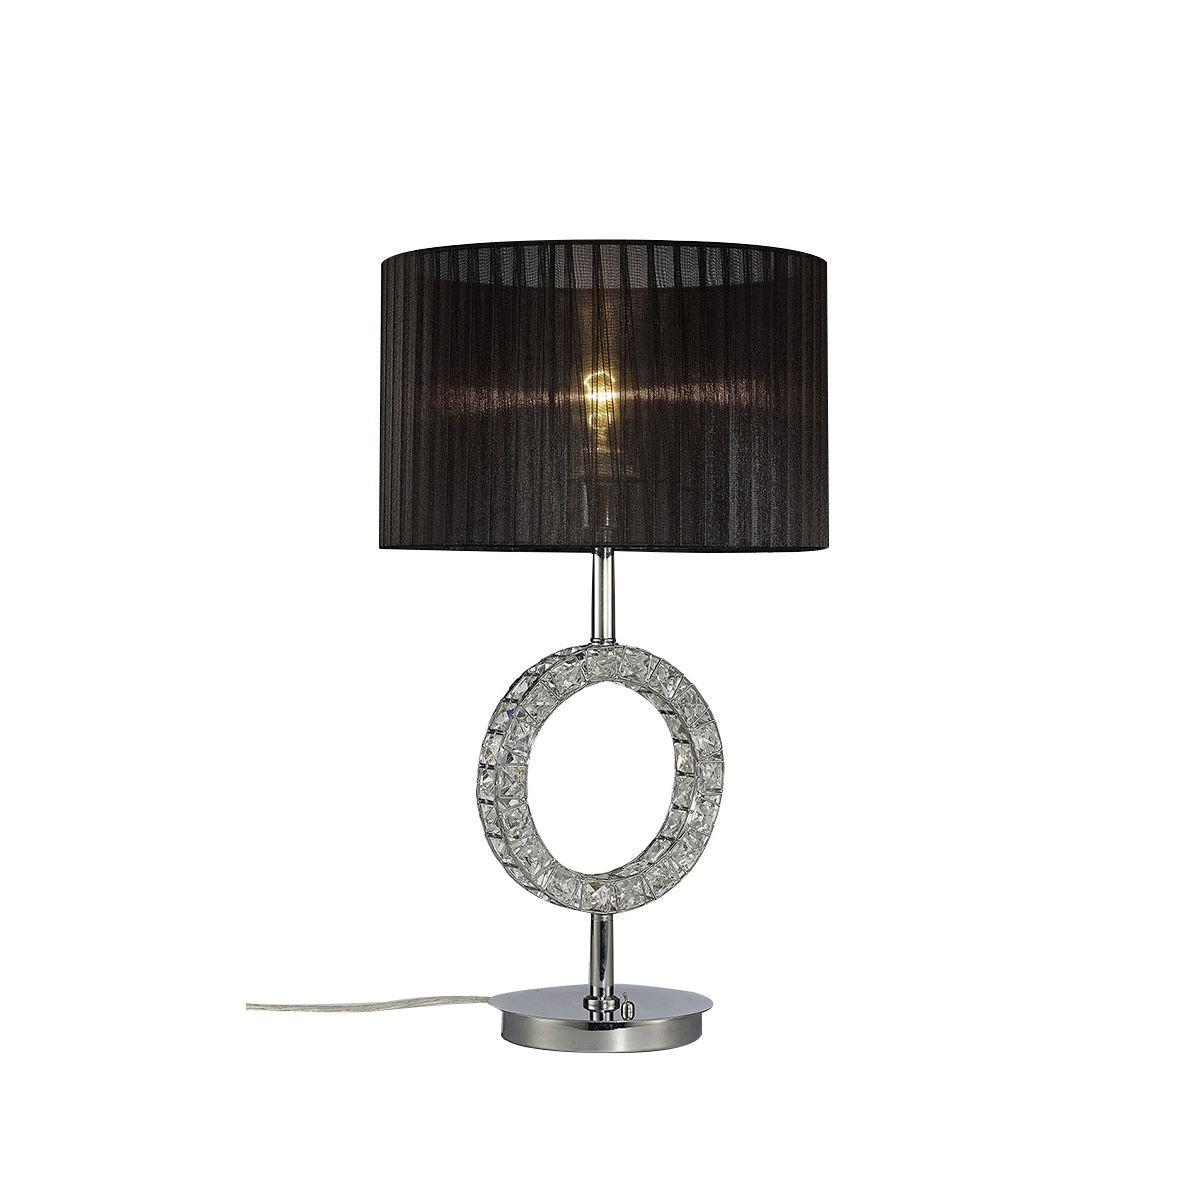 Diyas Florence Round Table Lamp With Black Shade 1 Light Polished Chrome/Crystal